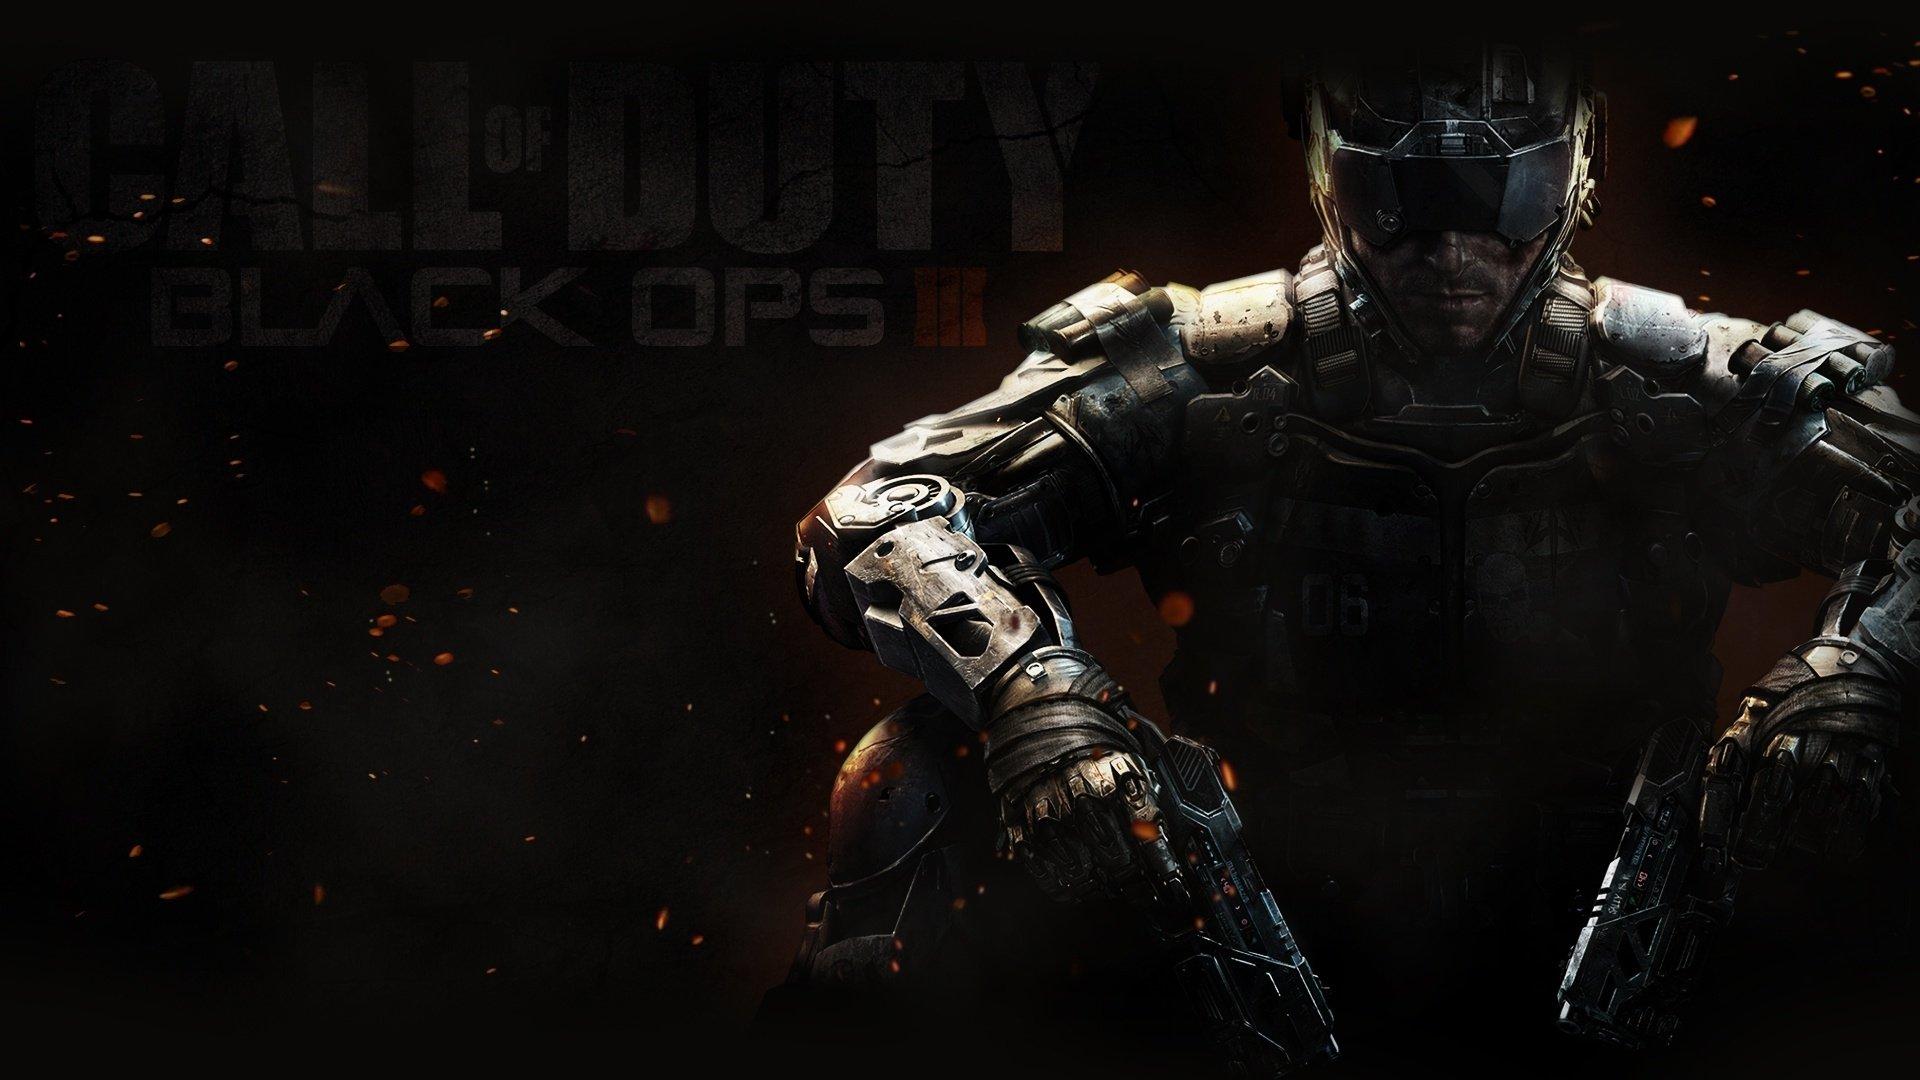 Call Of Duty Black Ops Iii Fondo De Pantalla Hd Fondo De